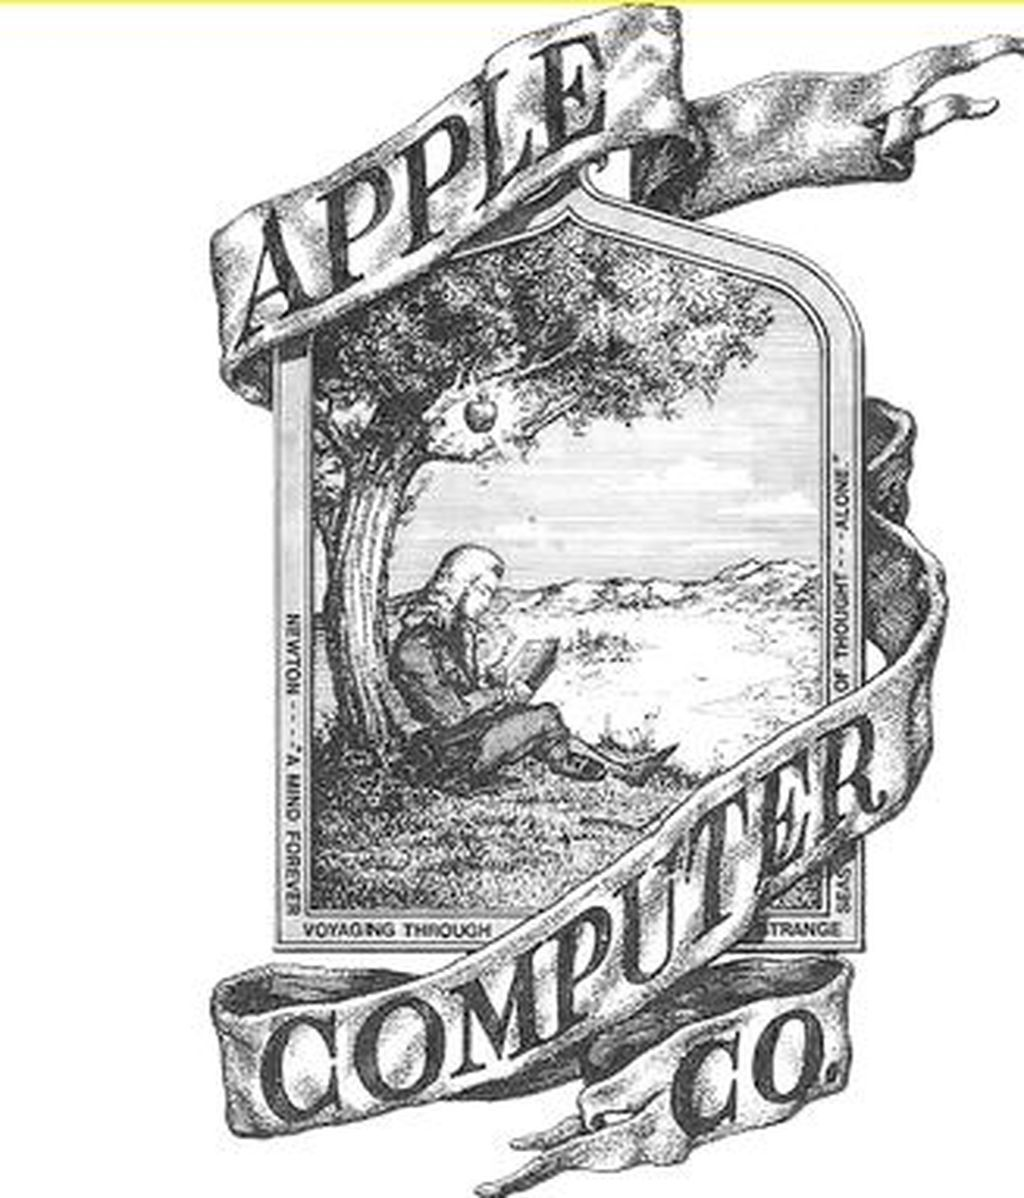 210328 soc logo apple dos